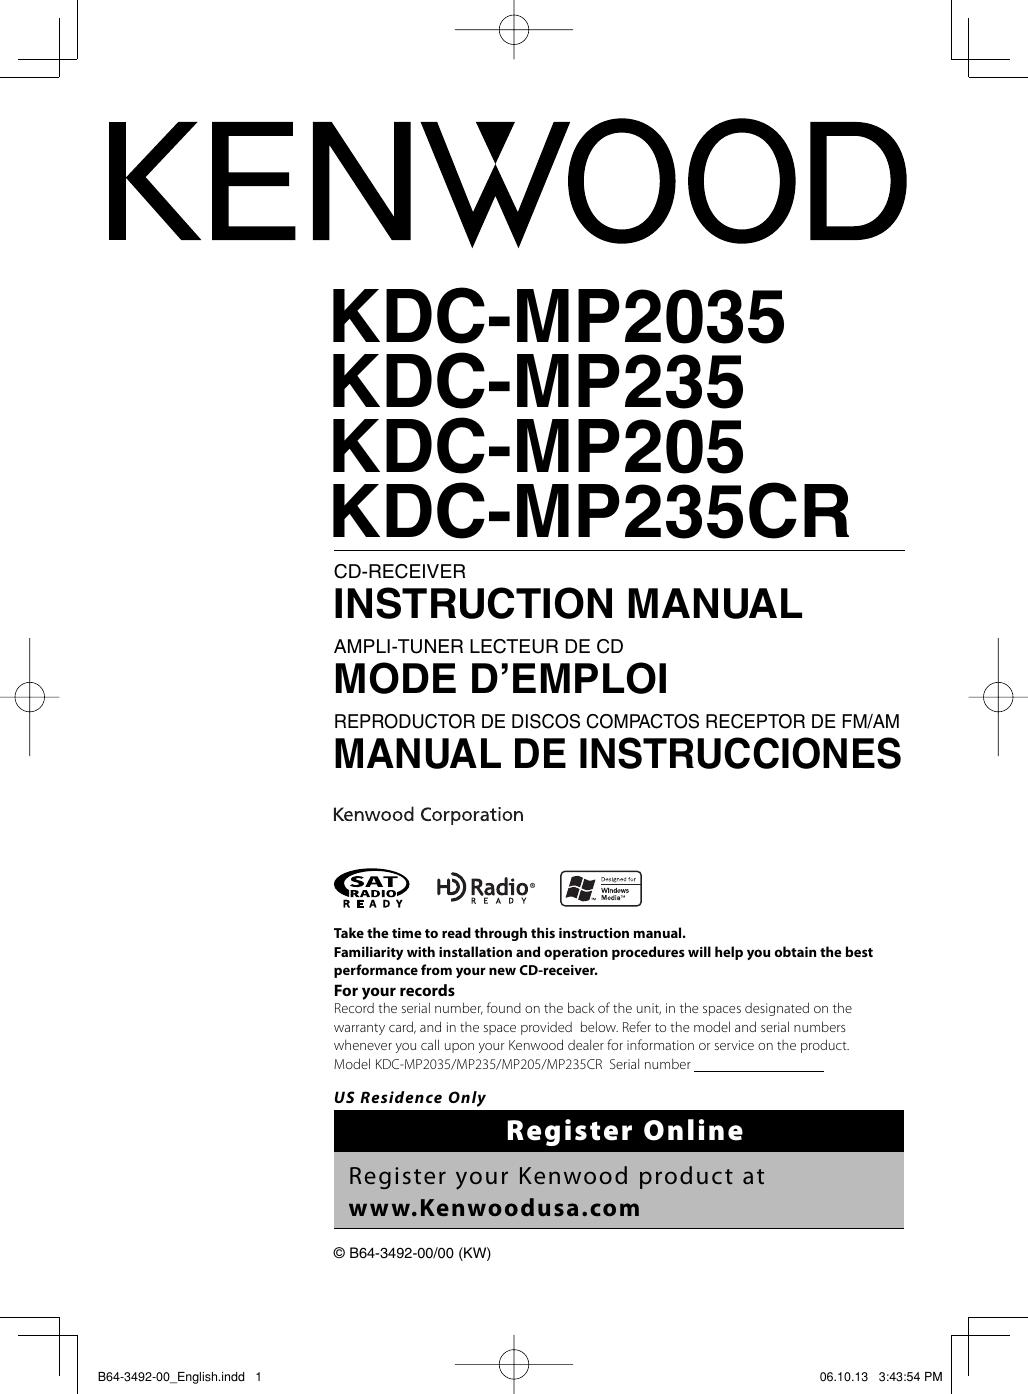 kenwood kdc mp235 owner s manual b64 3492 00_english pioneer wiring diagram head unit kenwood kdc mp205 wiring harness